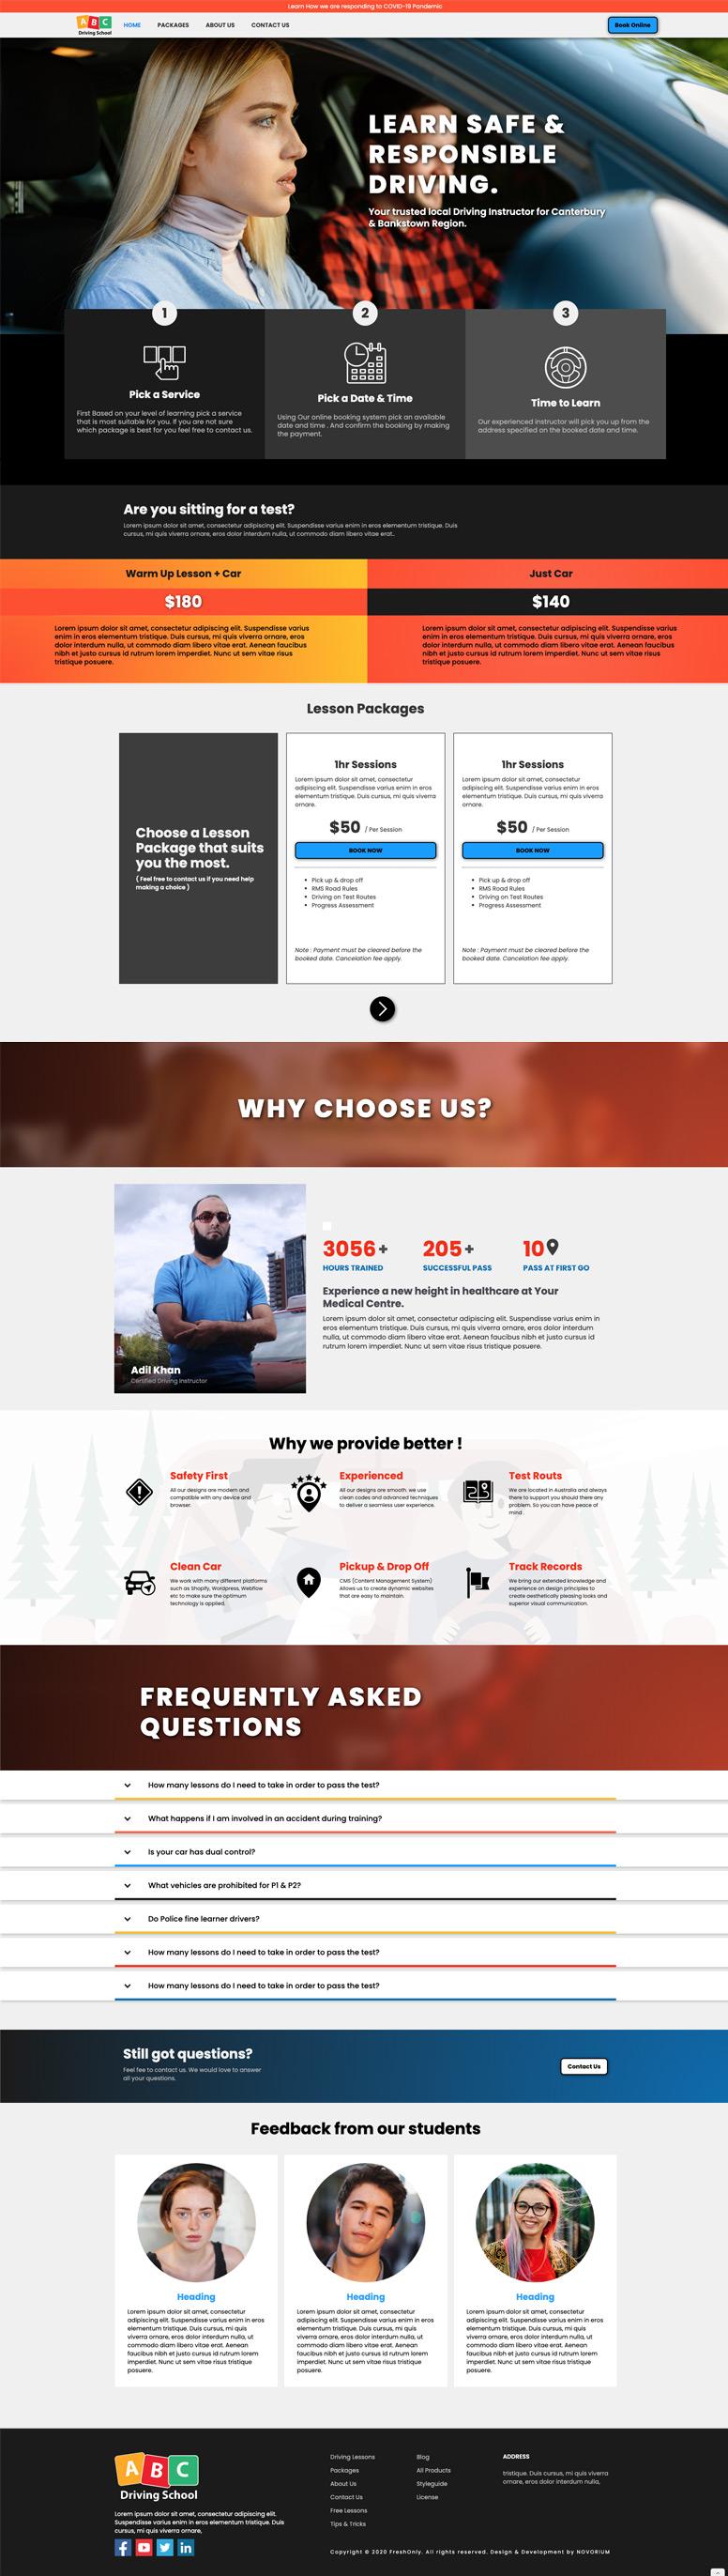 "Snapshot of ""Bookie"" demo website of a booking website."